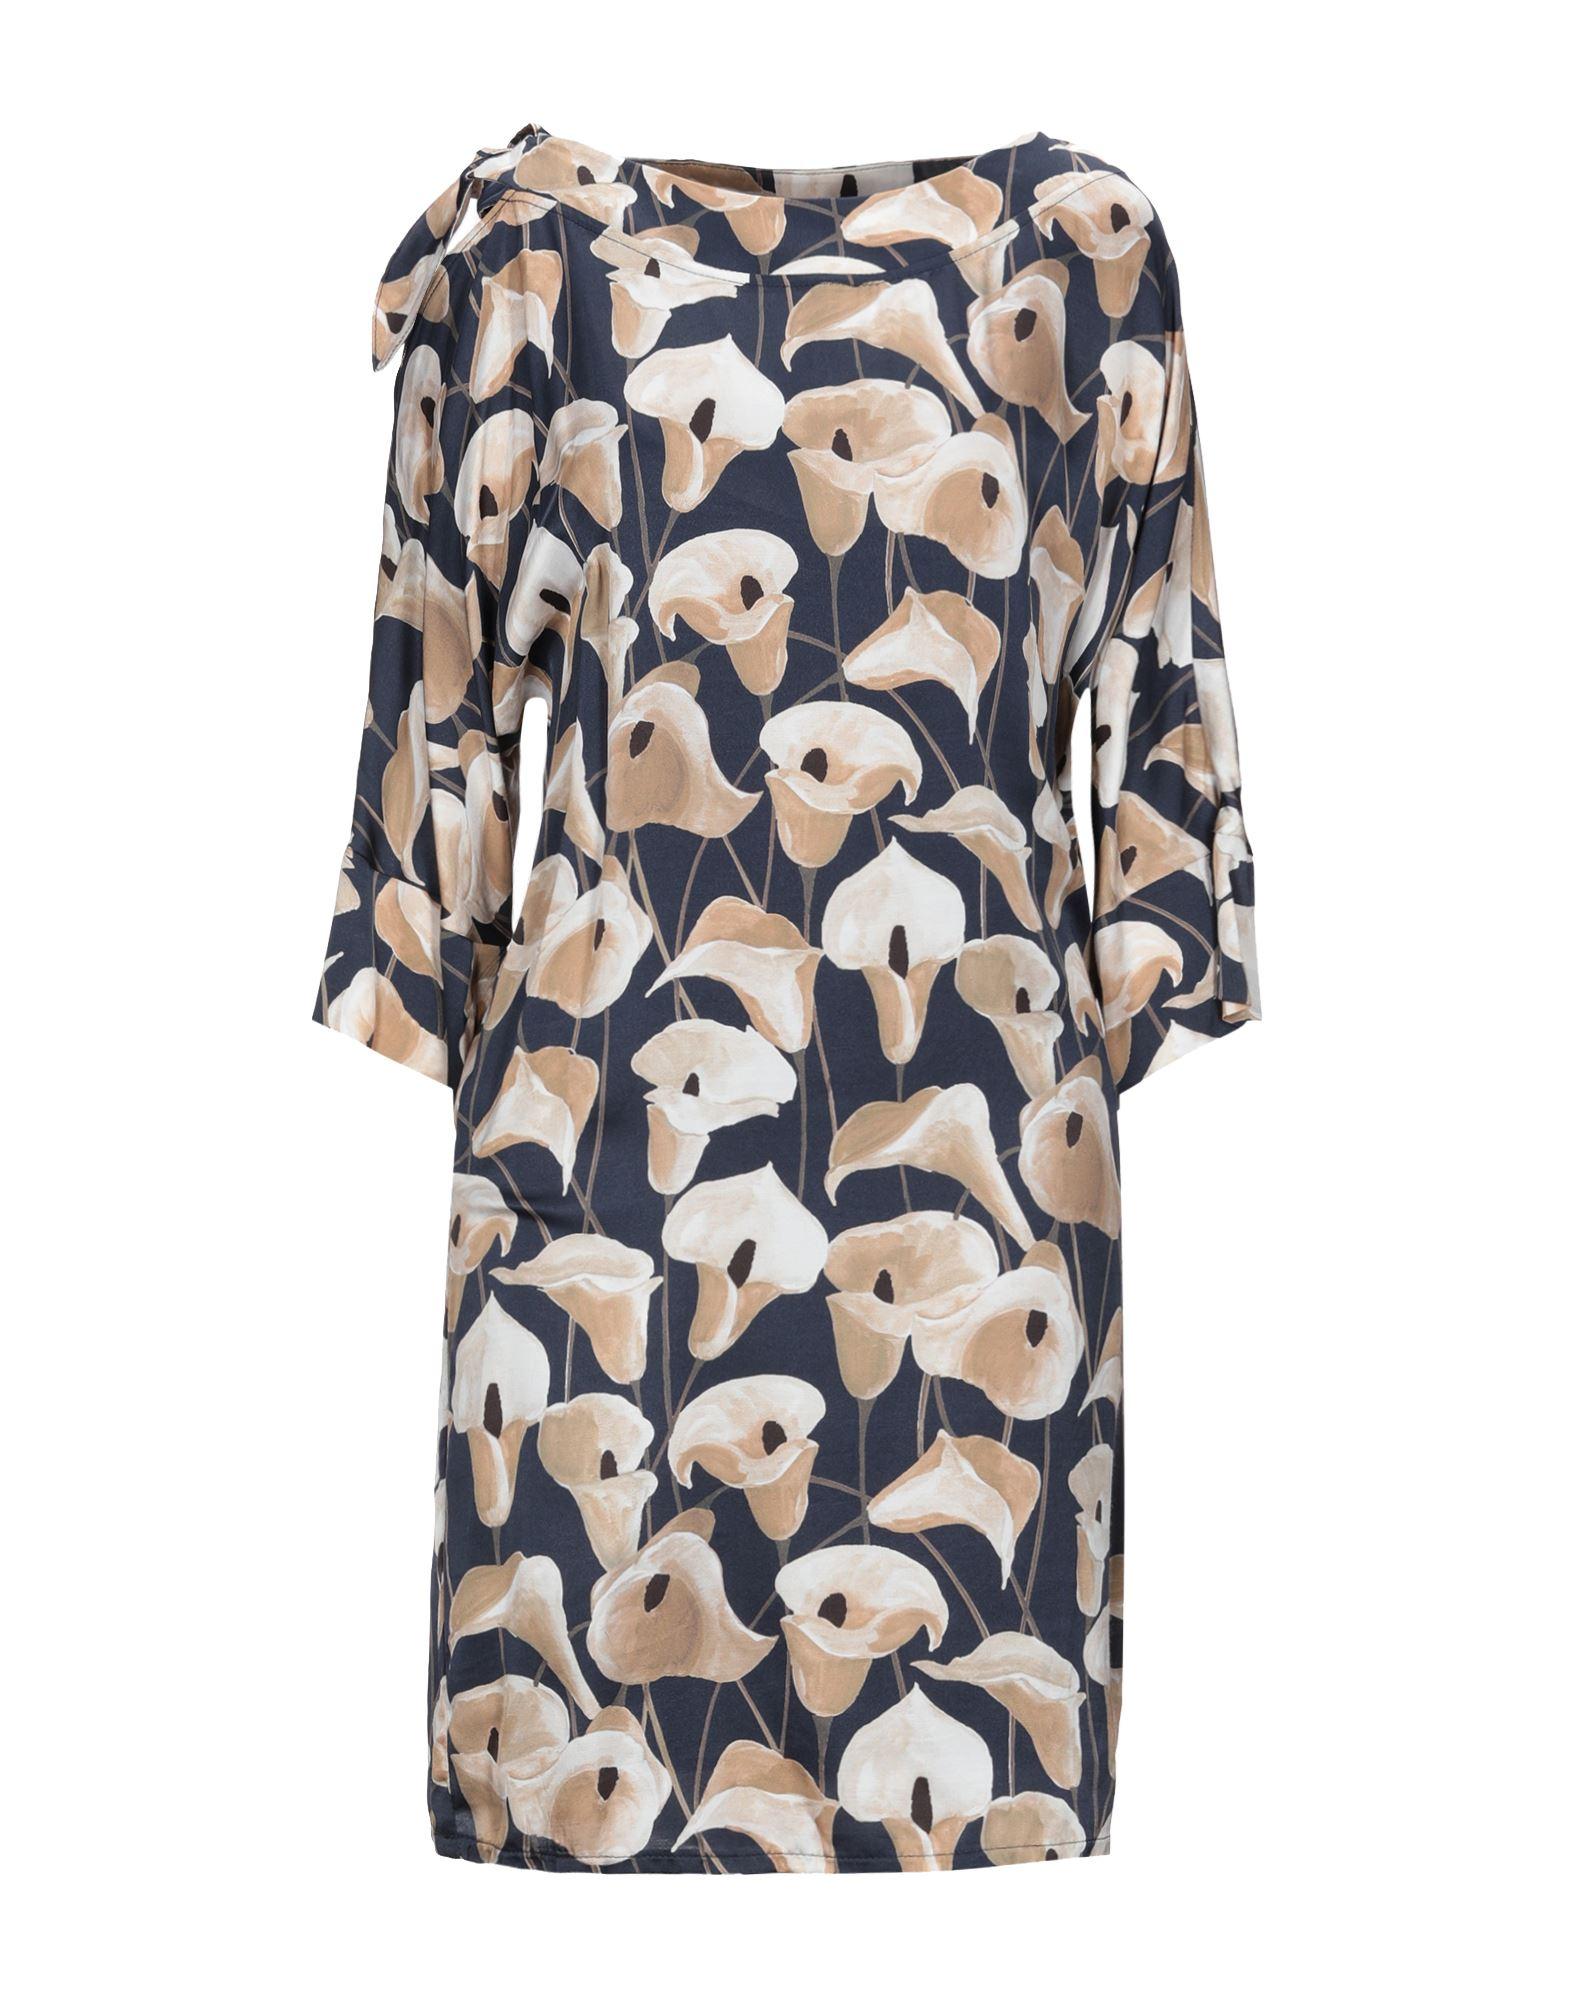 cristina gavioli collection длинное платье CRISTINA GAVIOLI COLLECTION Короткое платье